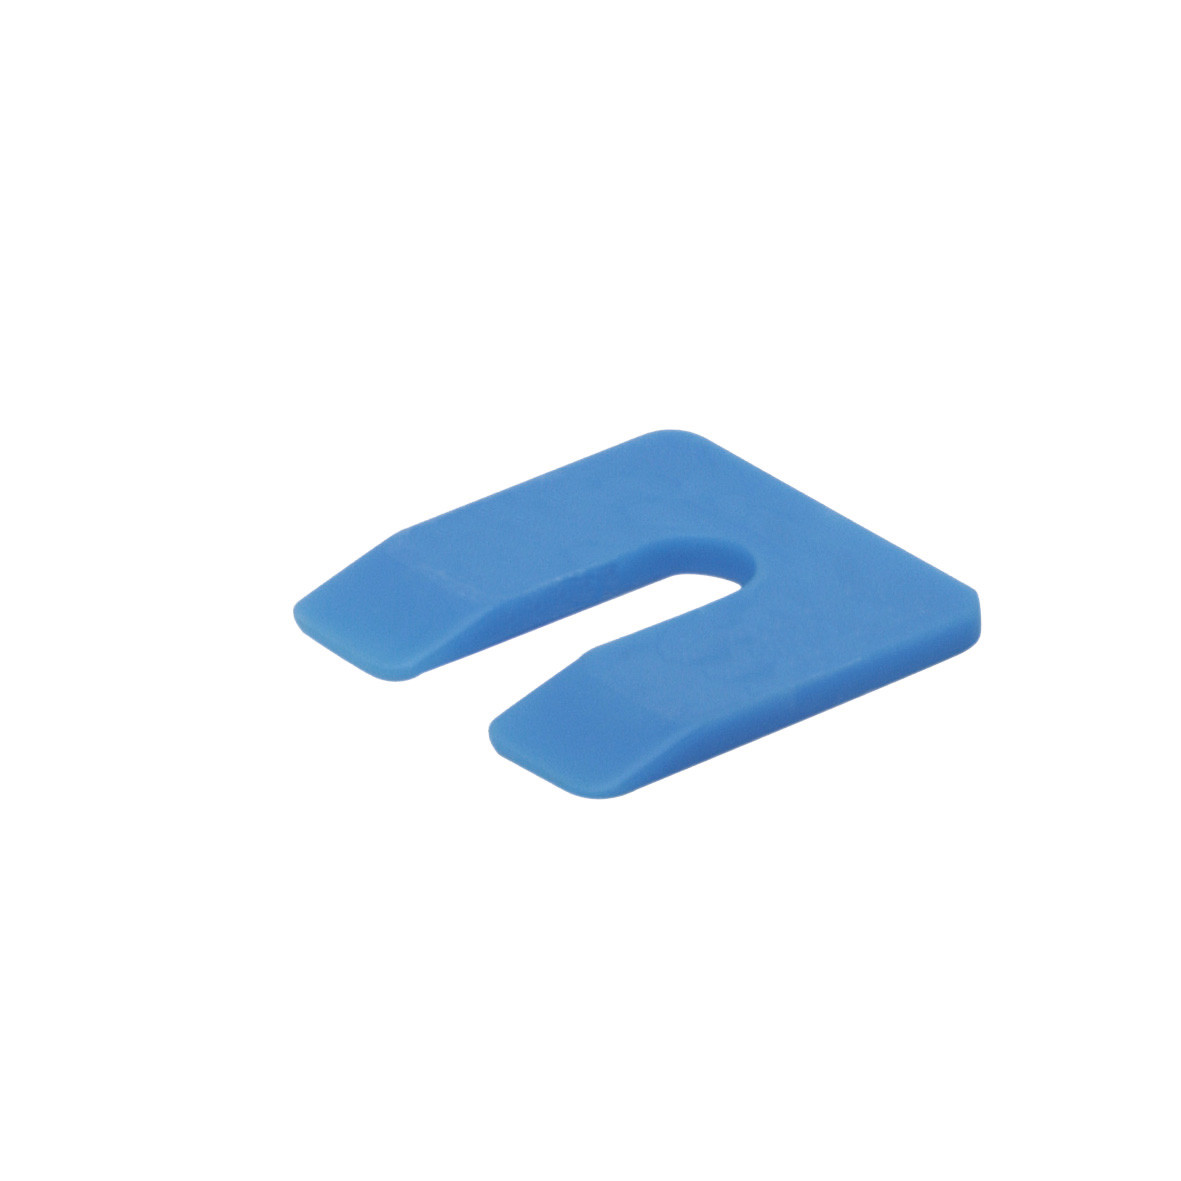 Wedge blue 4 50x50 KS